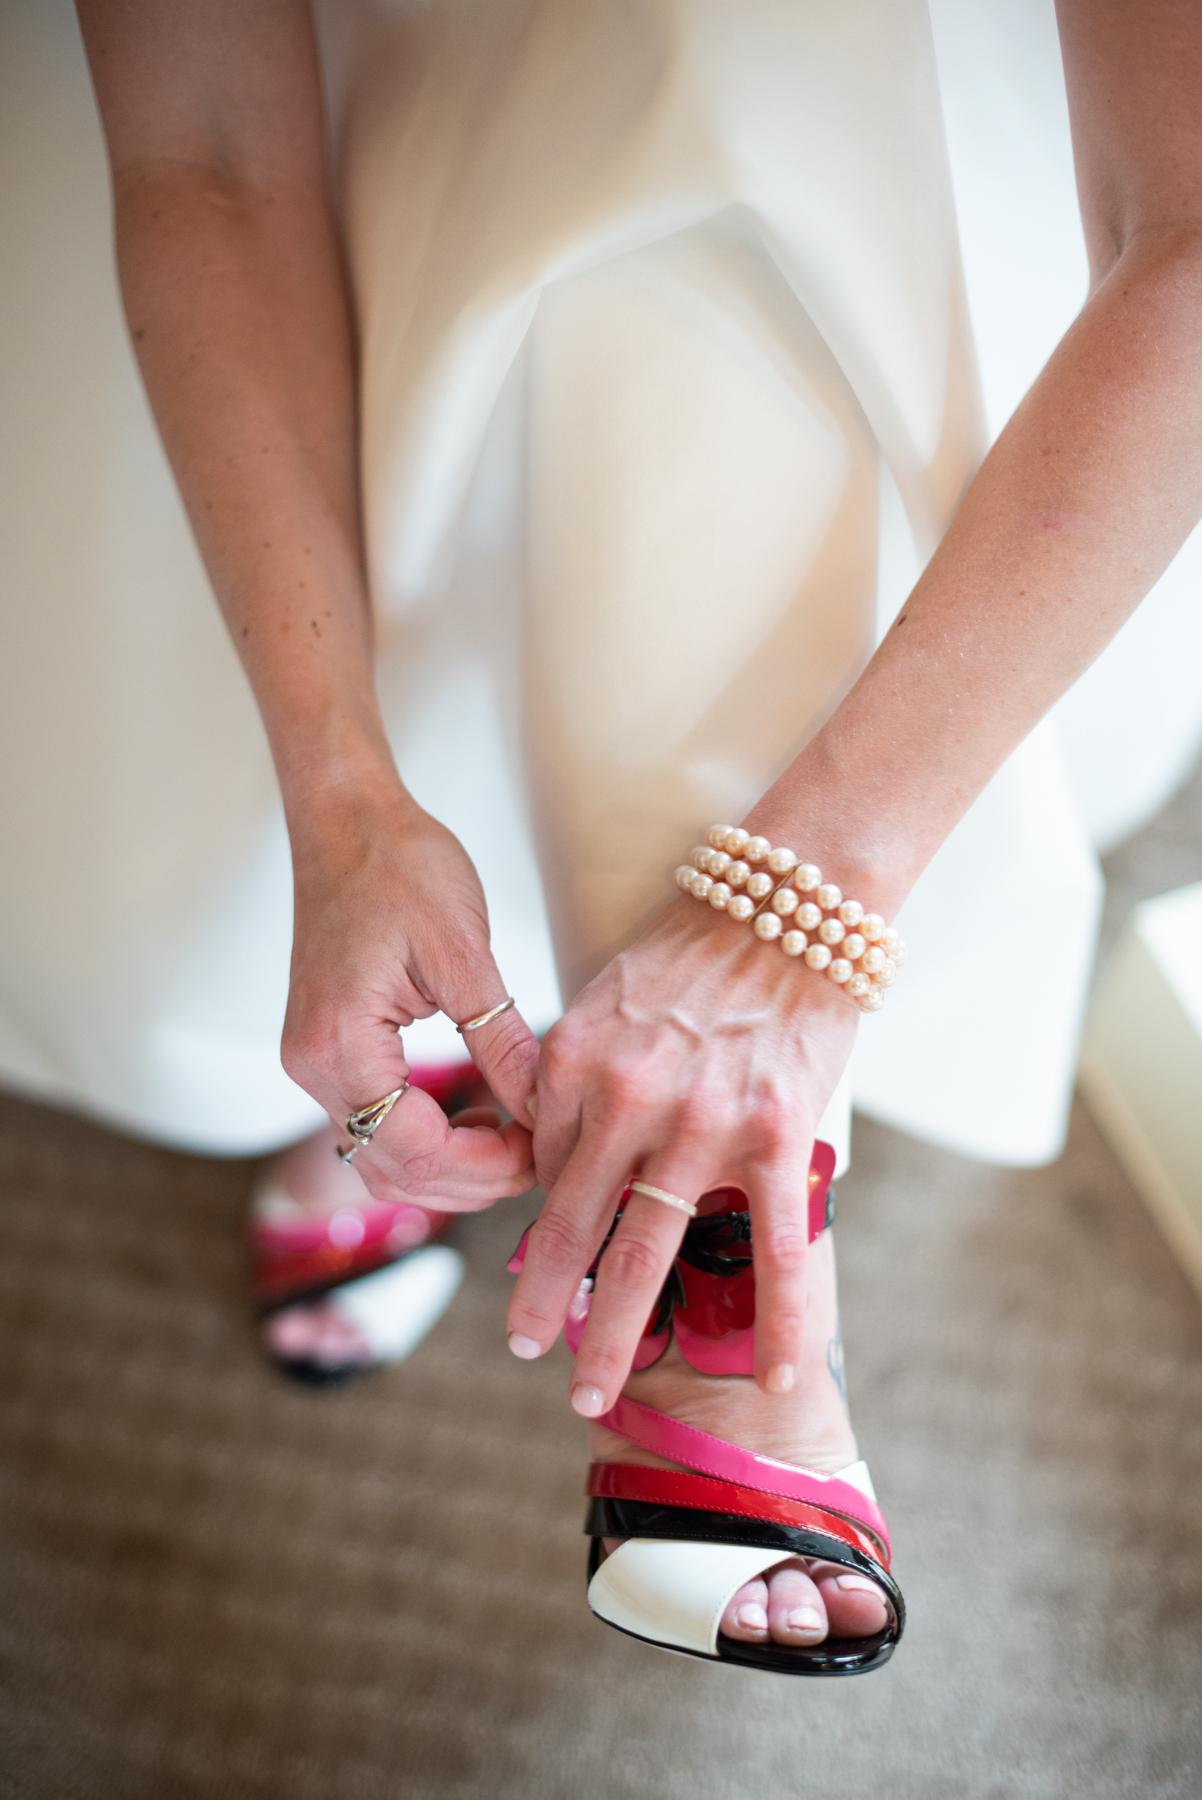 Secret Garden Event Center Wedding - Meredith Amadee Photography-4-3.jpg